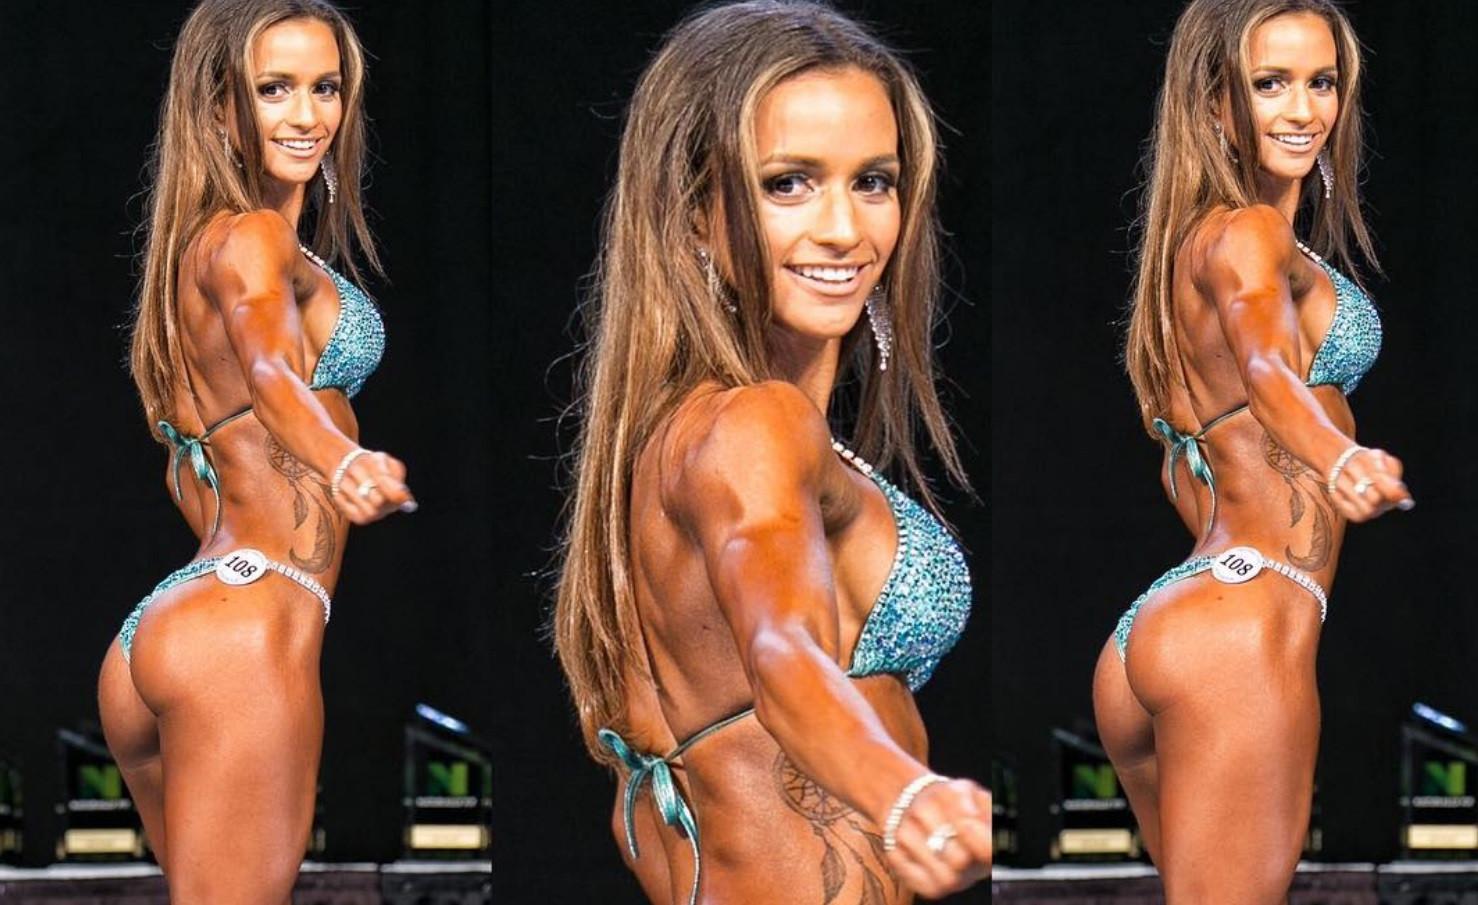 Vegan Bodybuilding Diet Women  Vegan Bodybuilder The Tip Diets That Gave Me My Best